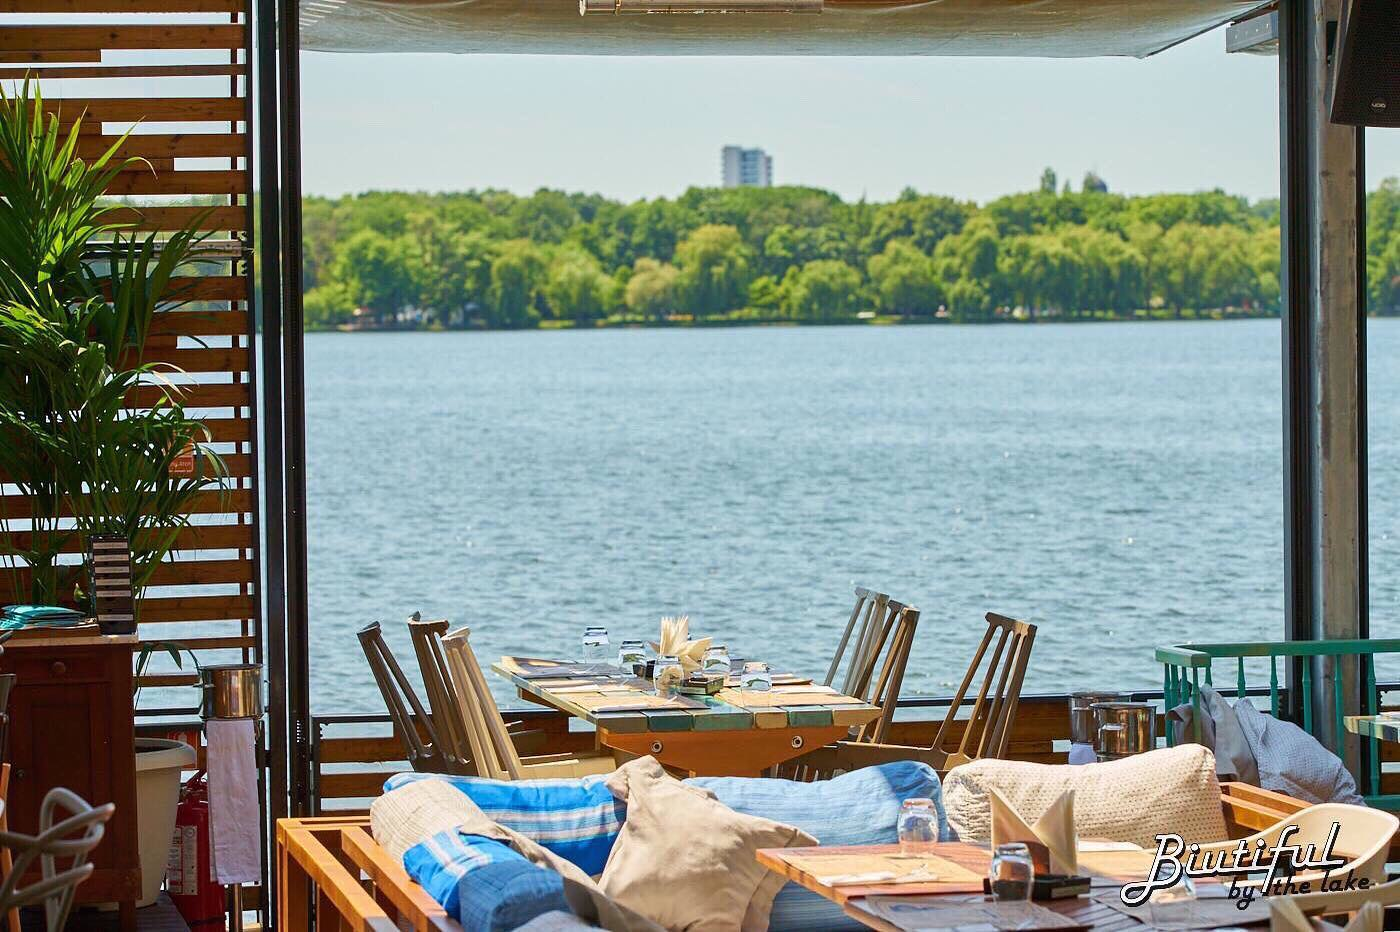 Terasa restaurantului Biutiful by the Lake, cu mese si priveliste catre lacul Herastrau